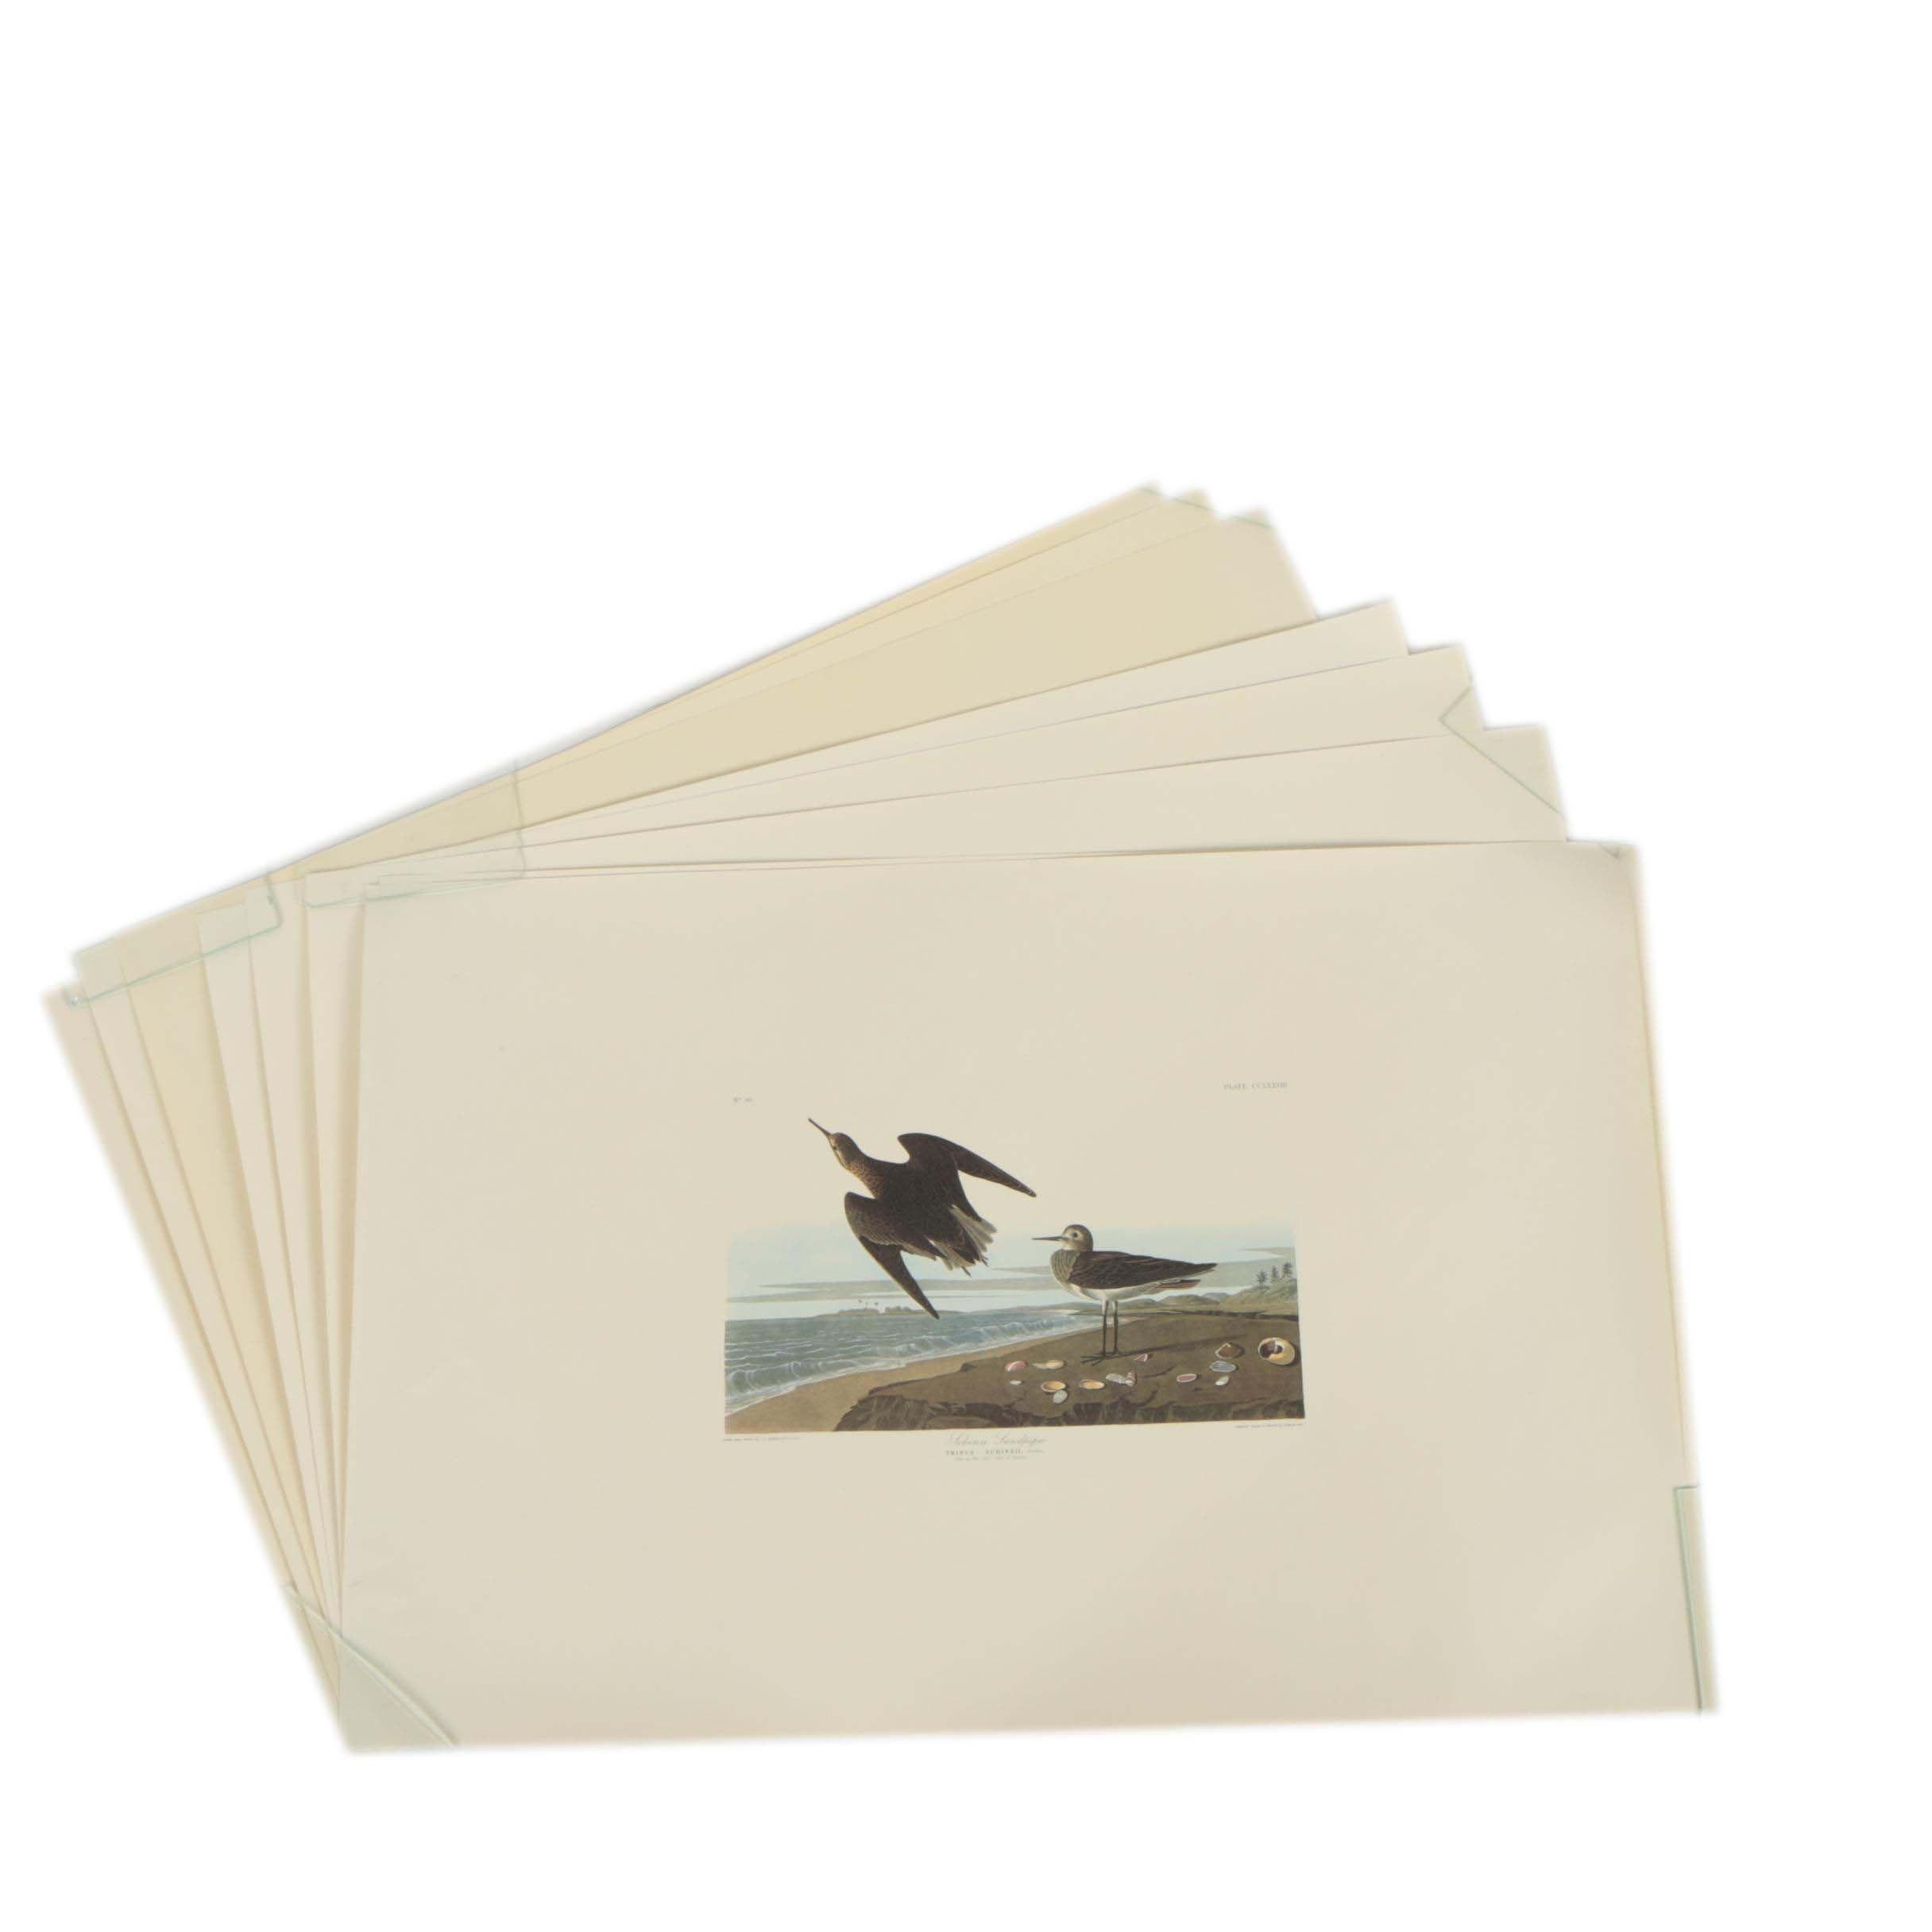 Offset Lithographs After John James Audubon's Illustrations of Birds